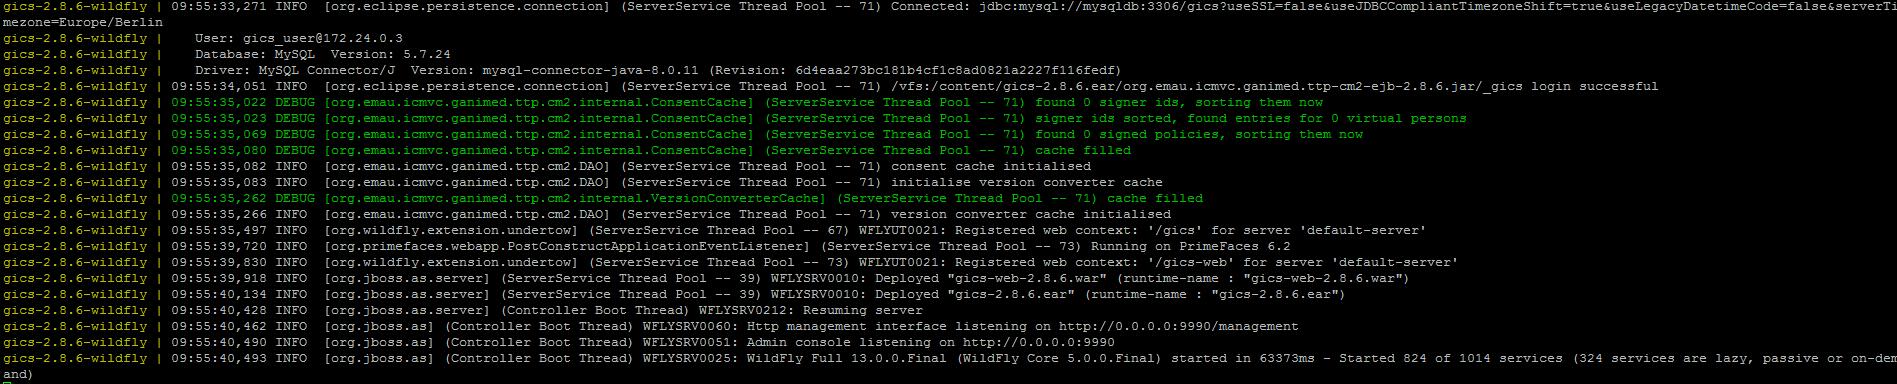 gics_install_succeeeded